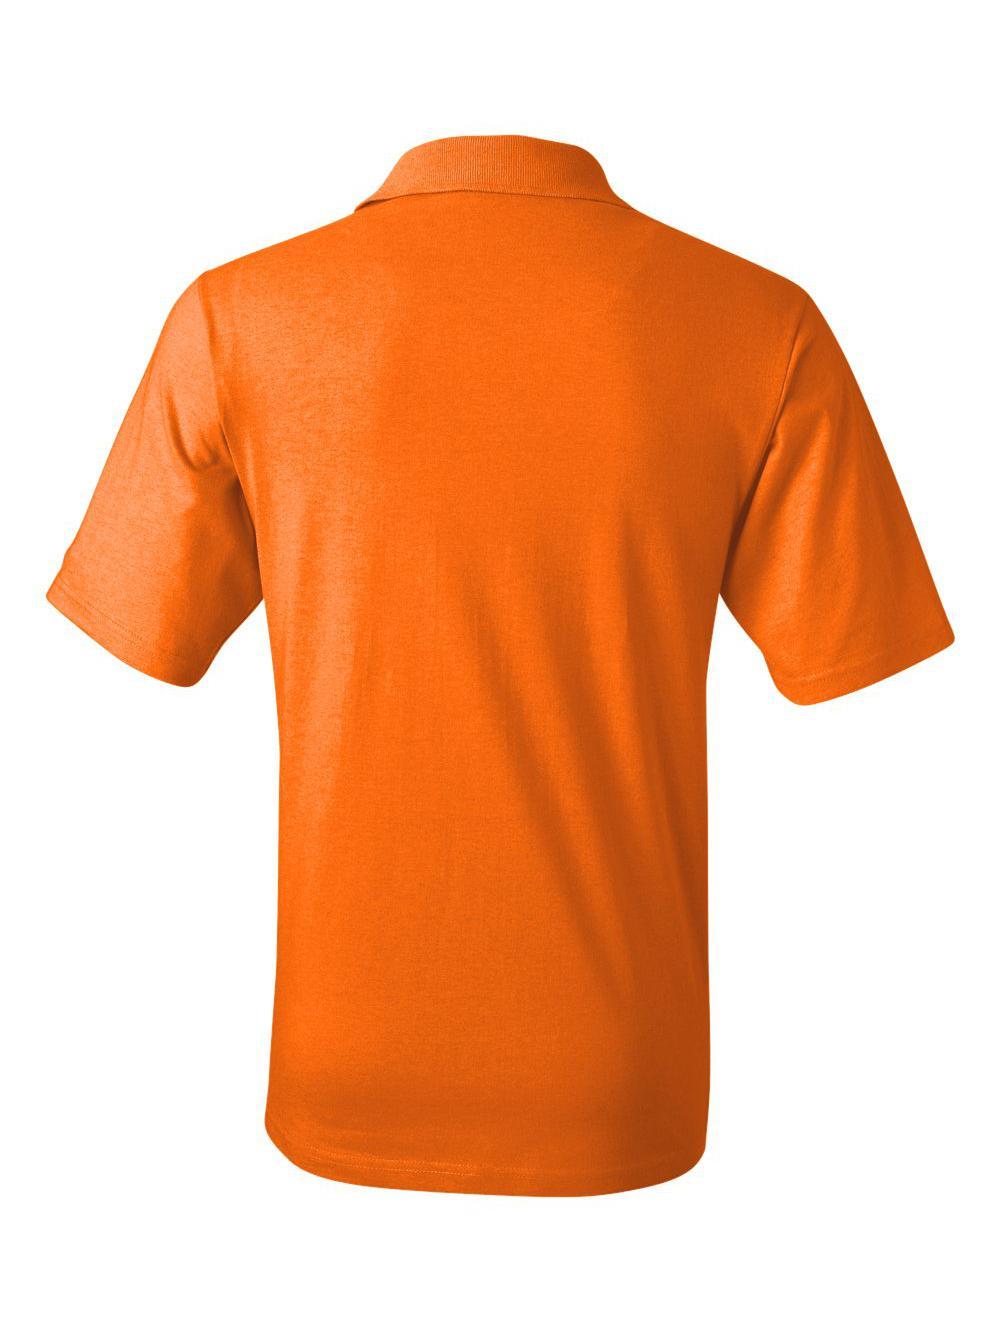 Jerzees Spotshield 5050 Jersey Knit Pocket Polo Shirt 436mpr